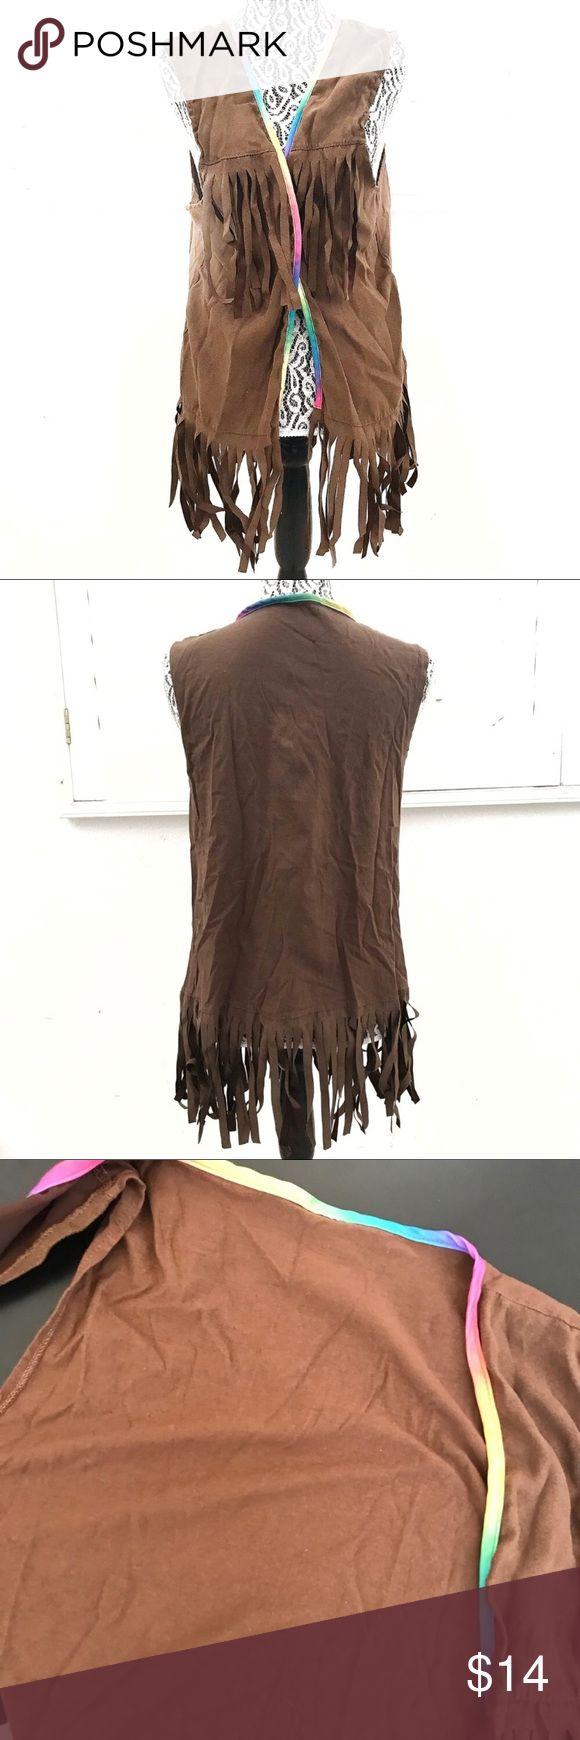 "Party City hippie fringe vest Pit to pit 21"" Length 29""  Tags: hippie Halloween costume Party City Jackets & Coats Vests"